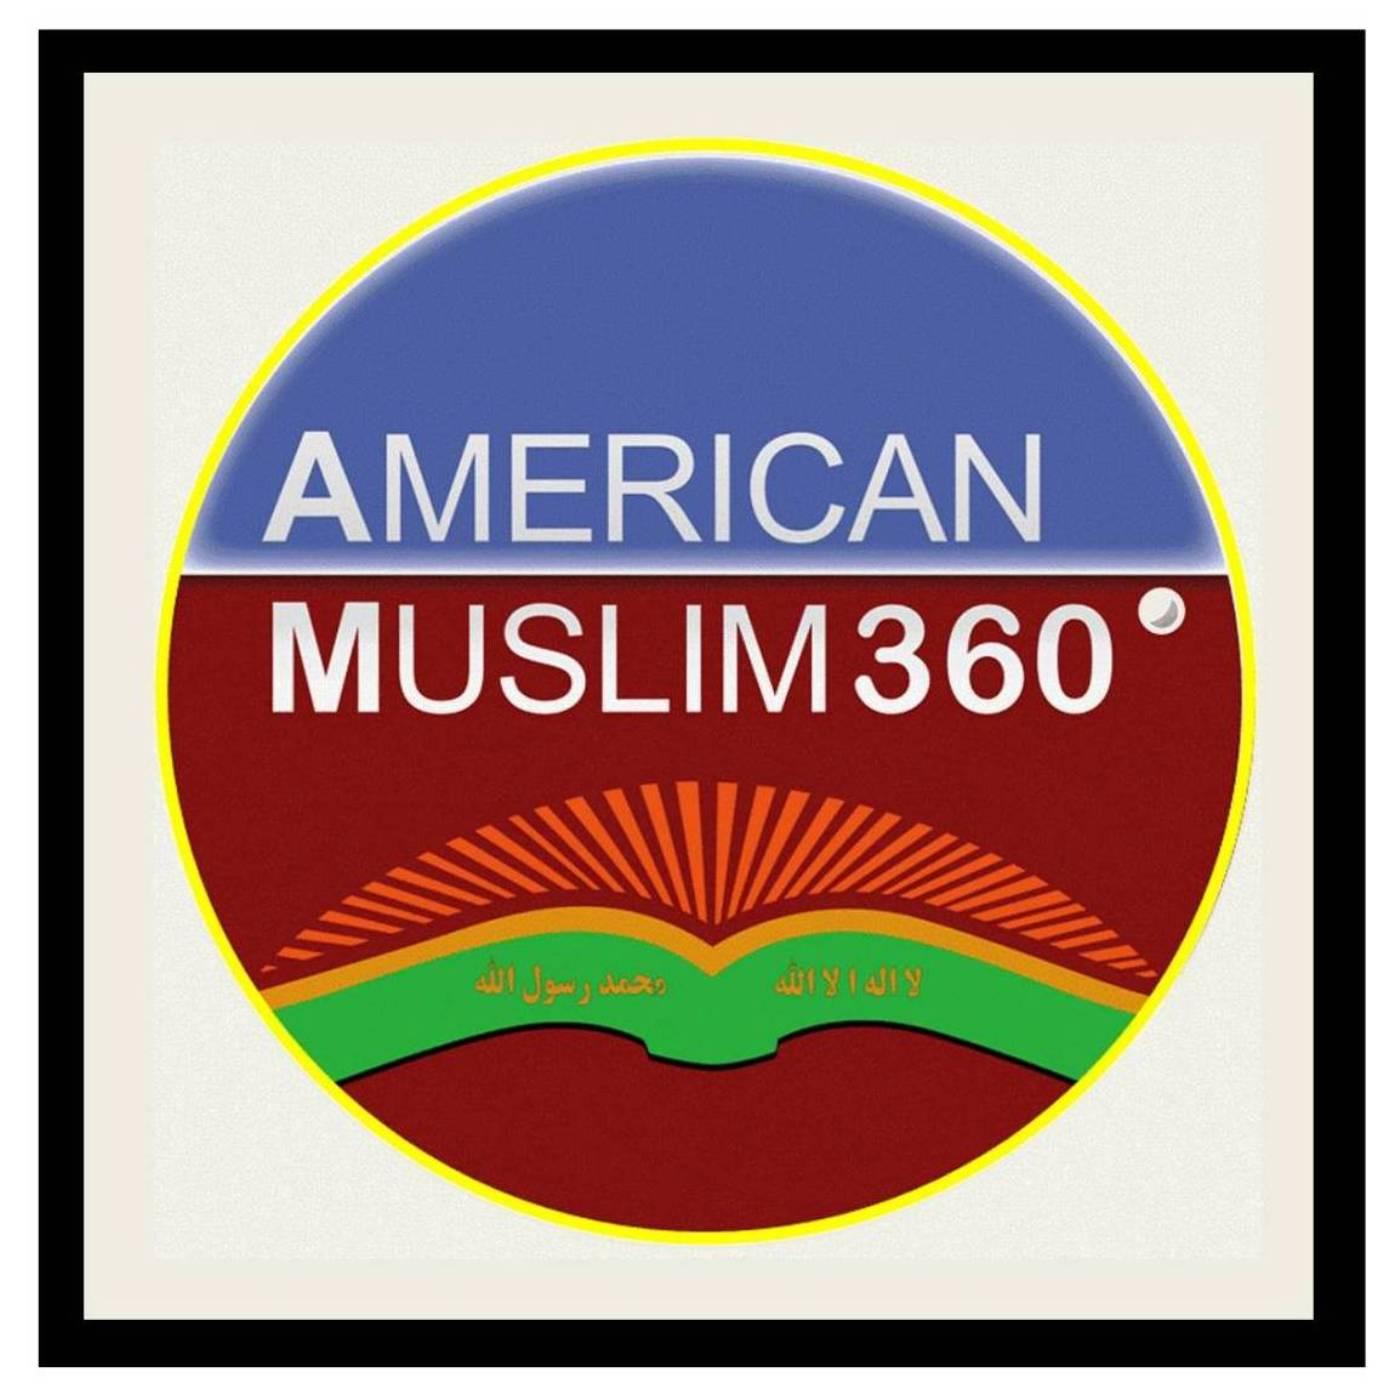 American Muslim 360 Radio Network